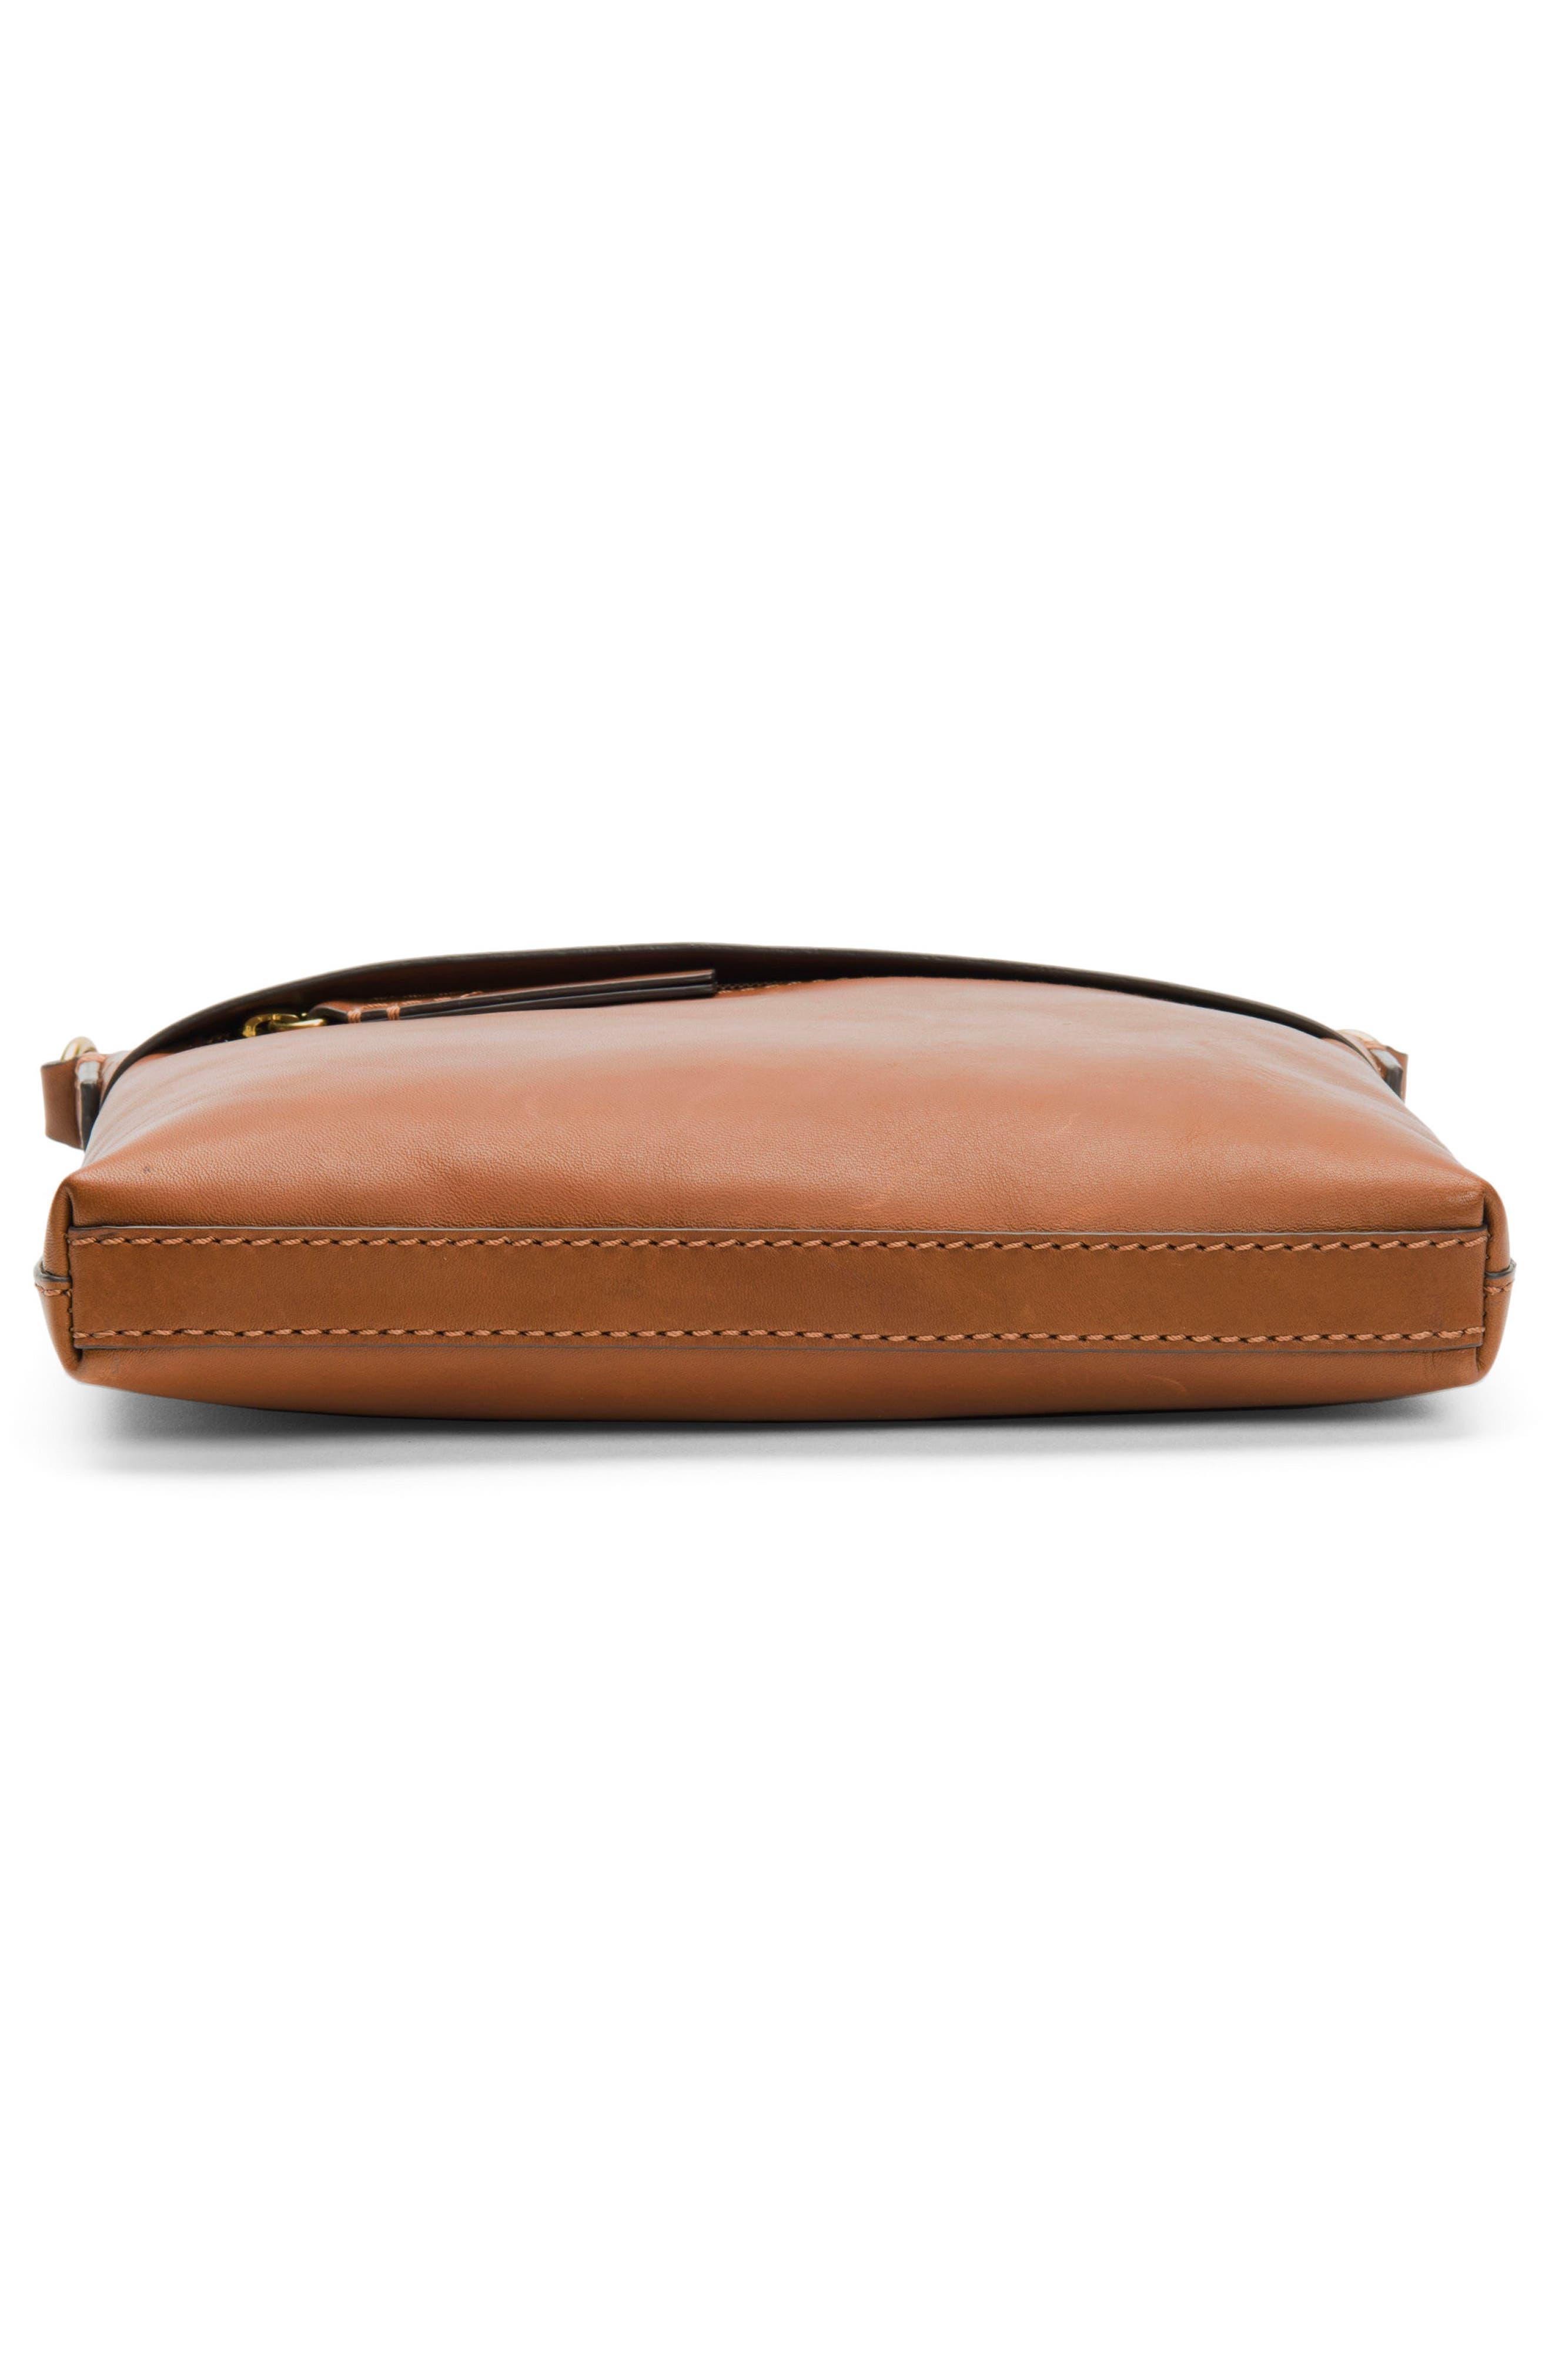 Carson Leather Crossbody Bag,                             Alternate thumbnail 5, color,                             COGNAC